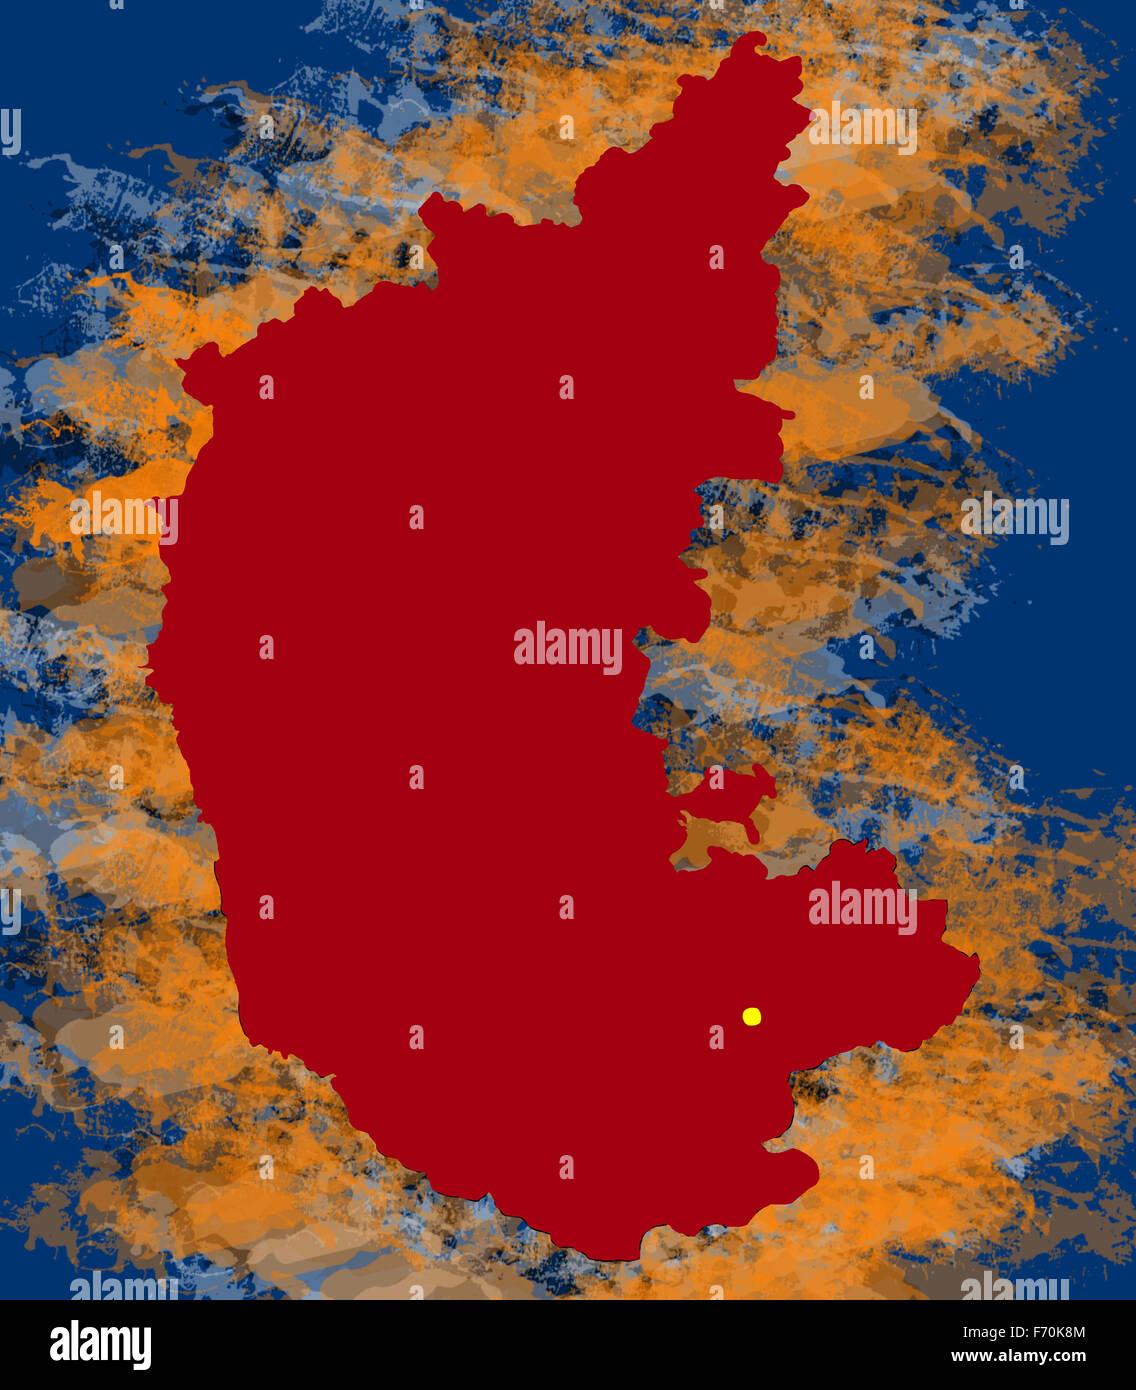 Karnataka Map Stock Photos & Karnataka Map Stock Images - Alamy